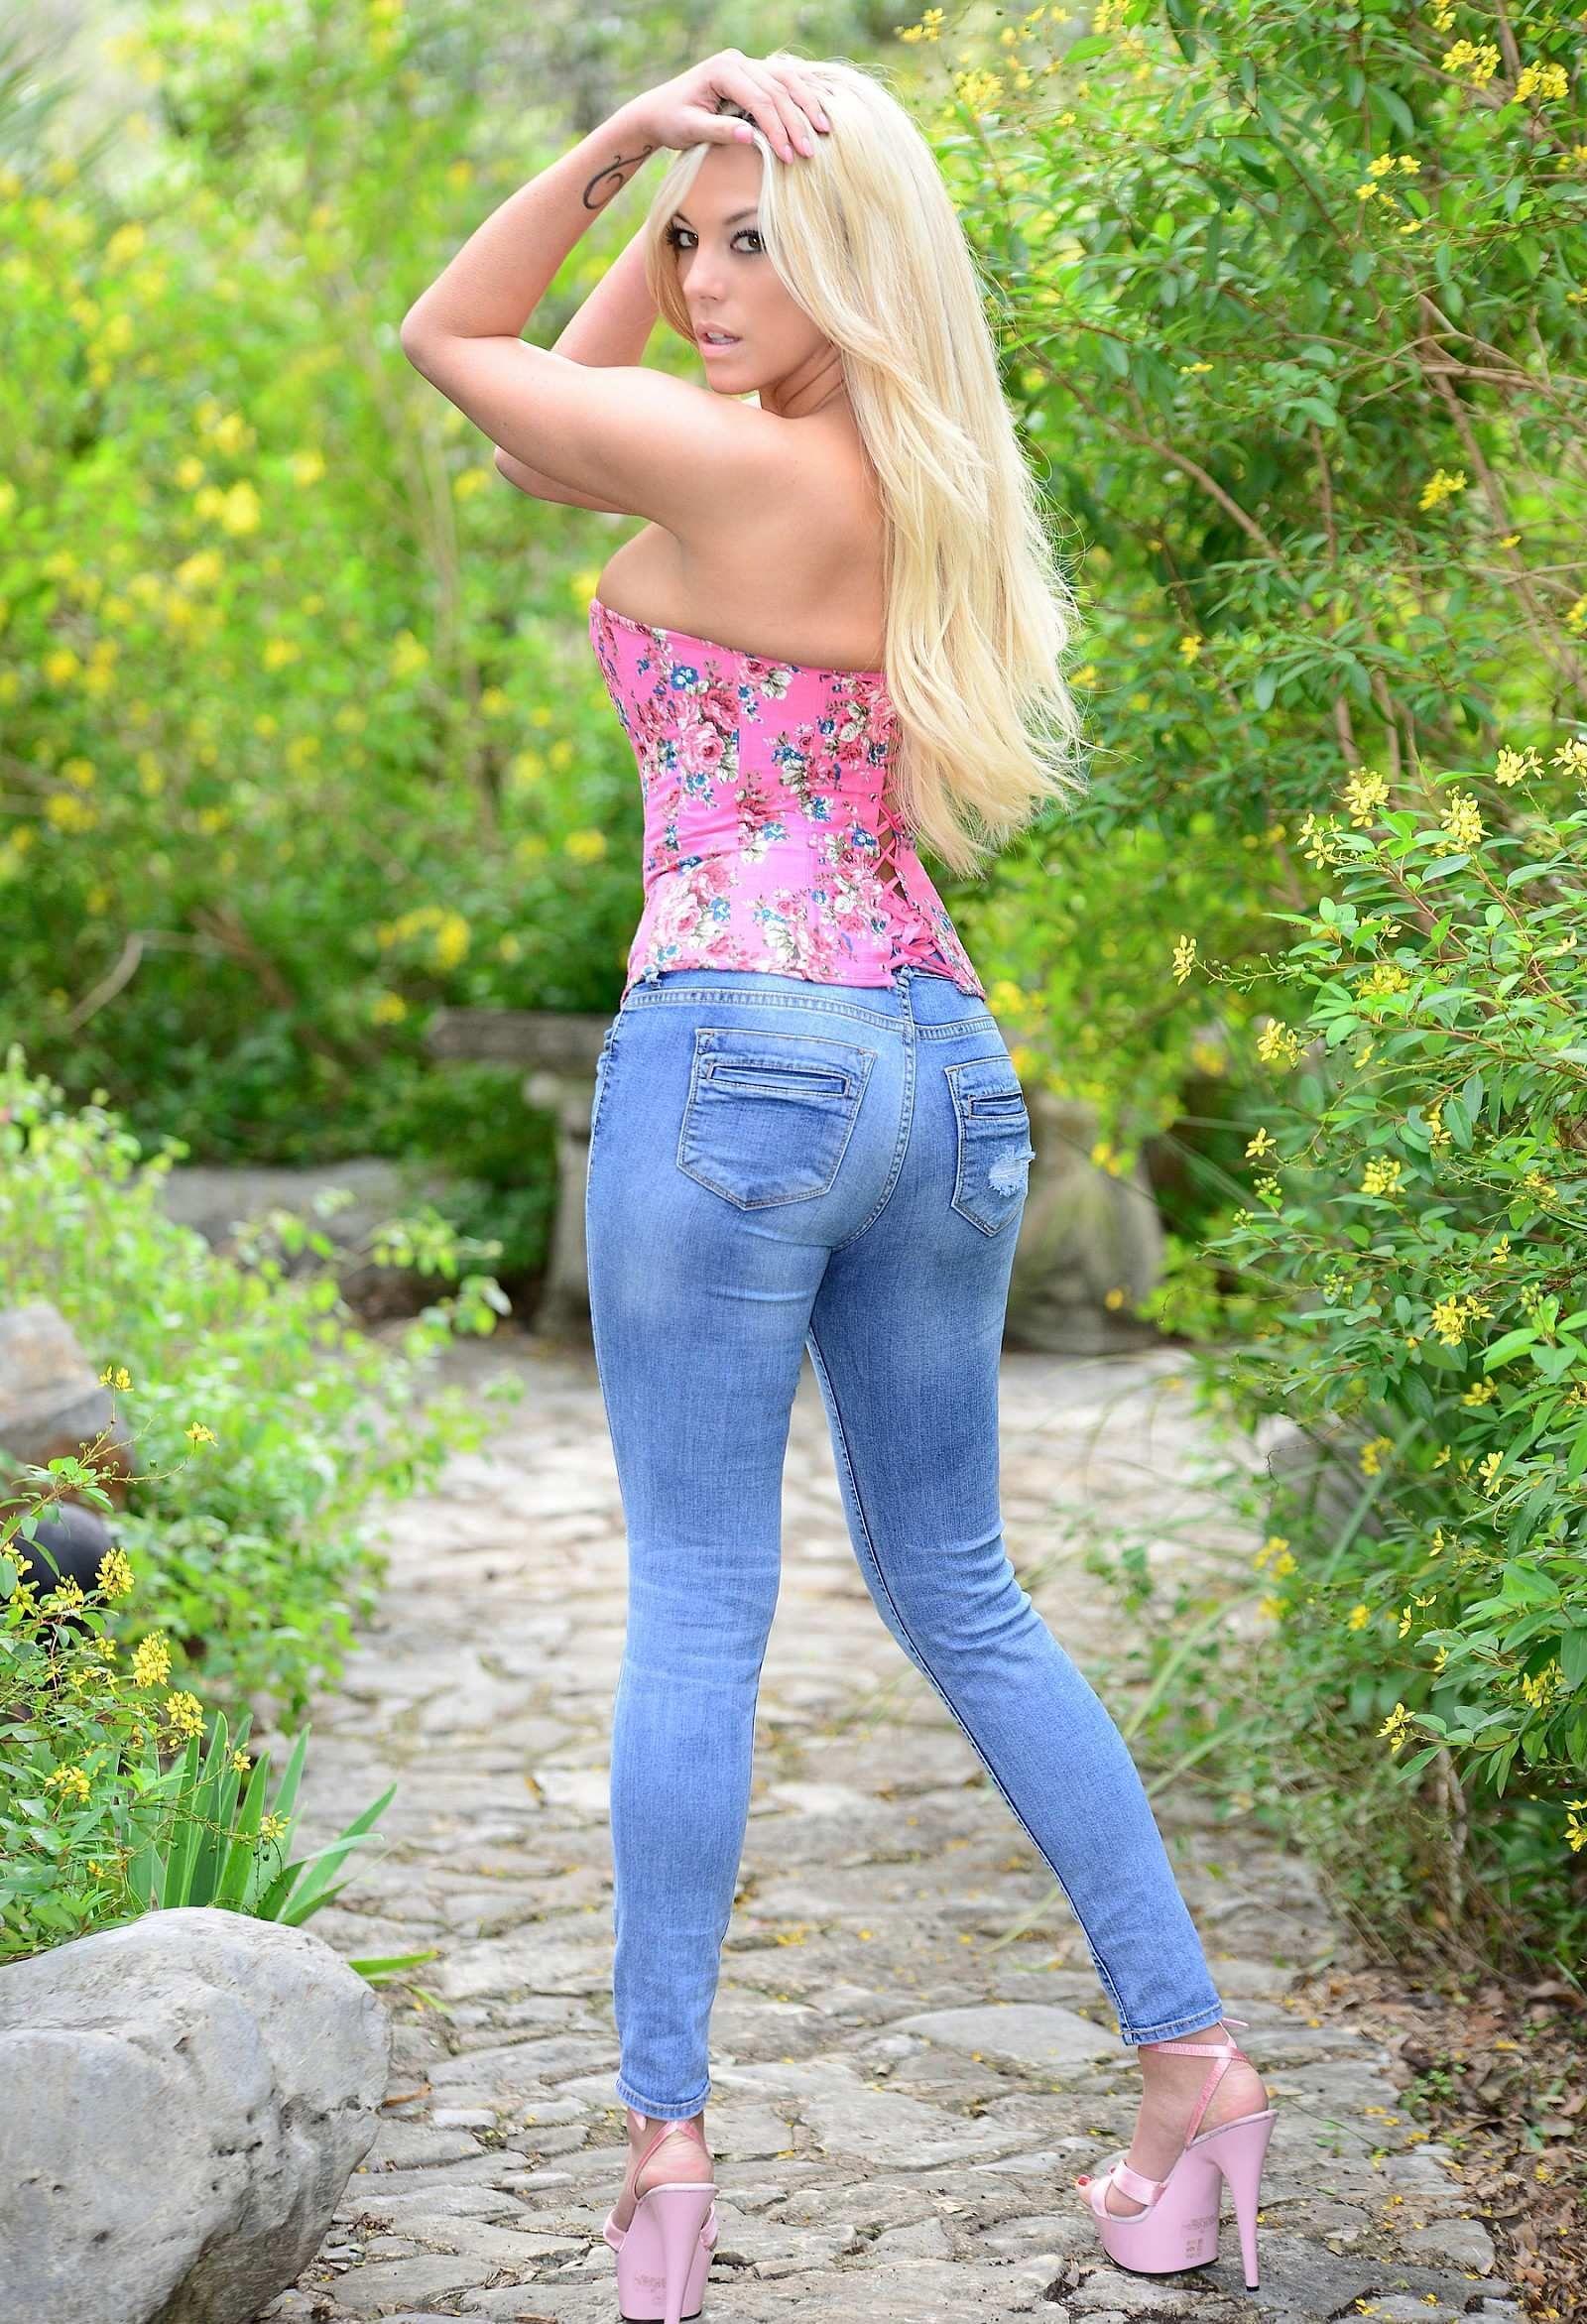 Tiffany Bastow - Gisele : Gears and Girls